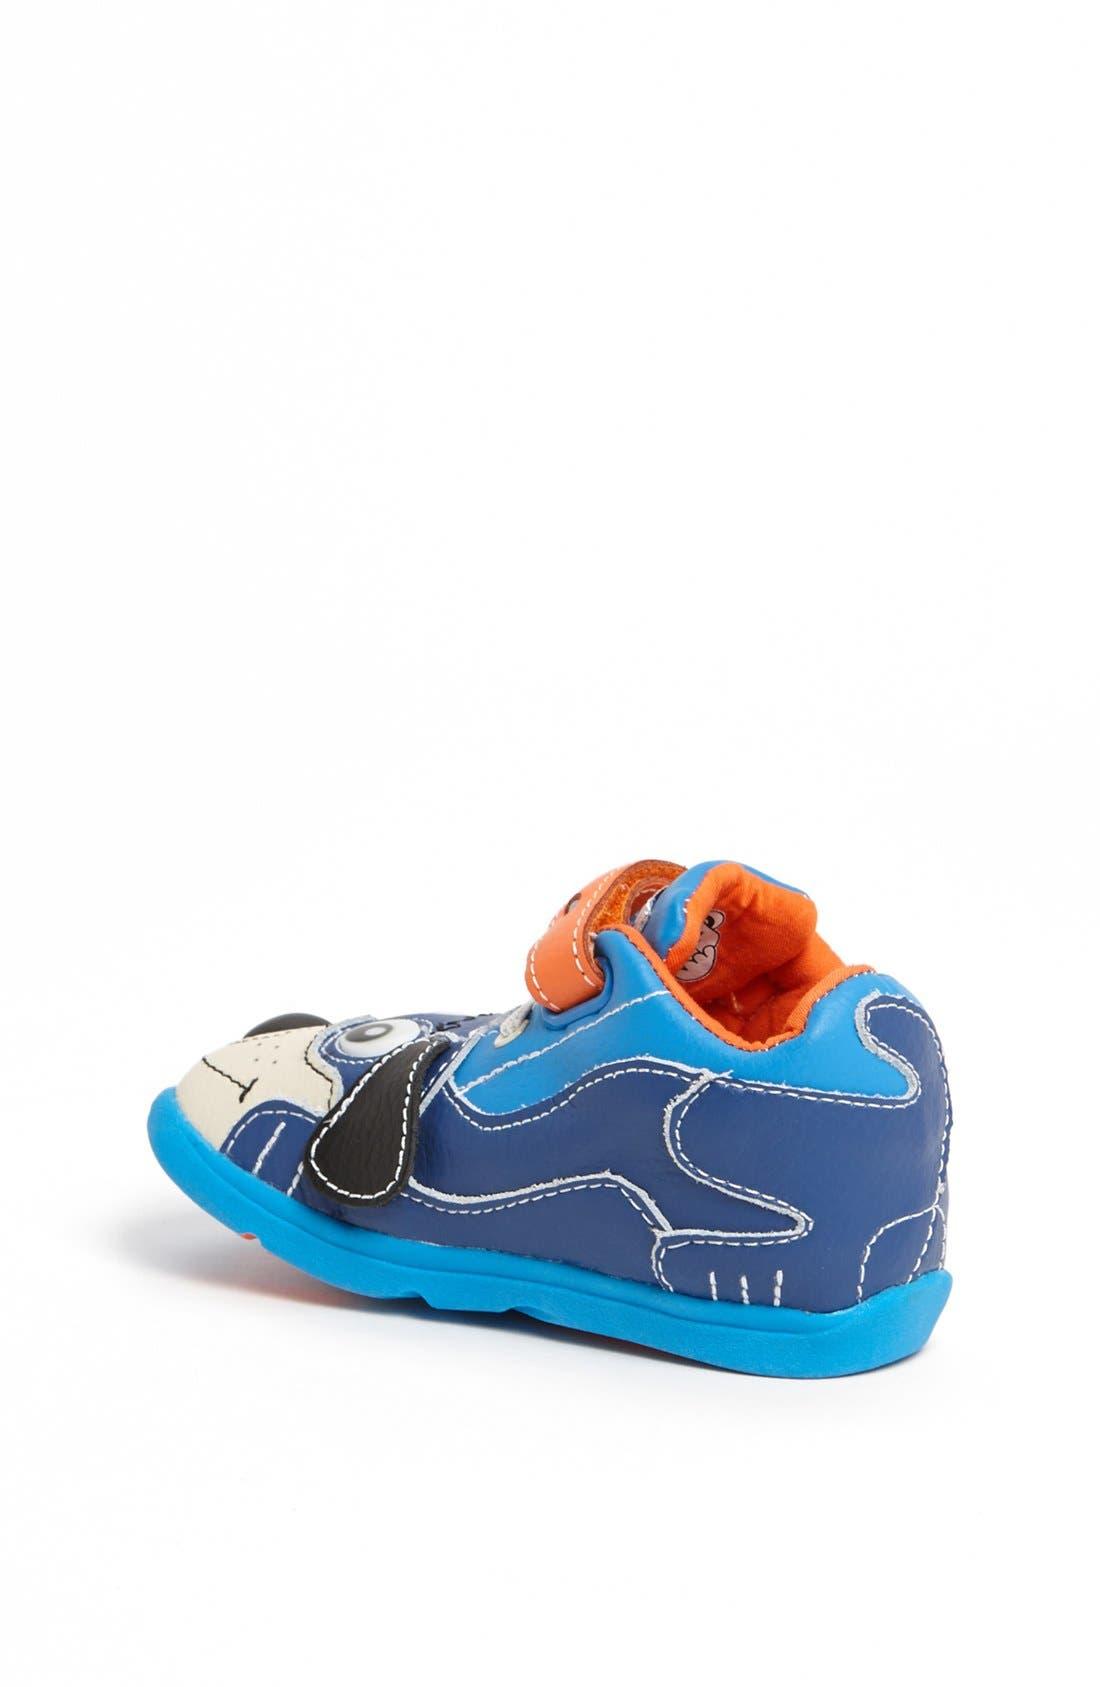 Alternate Image 2  - Zooligans™ 'Sparky the Puppy' Sneaker (Baby, Walker, Toddler & Little Kid)